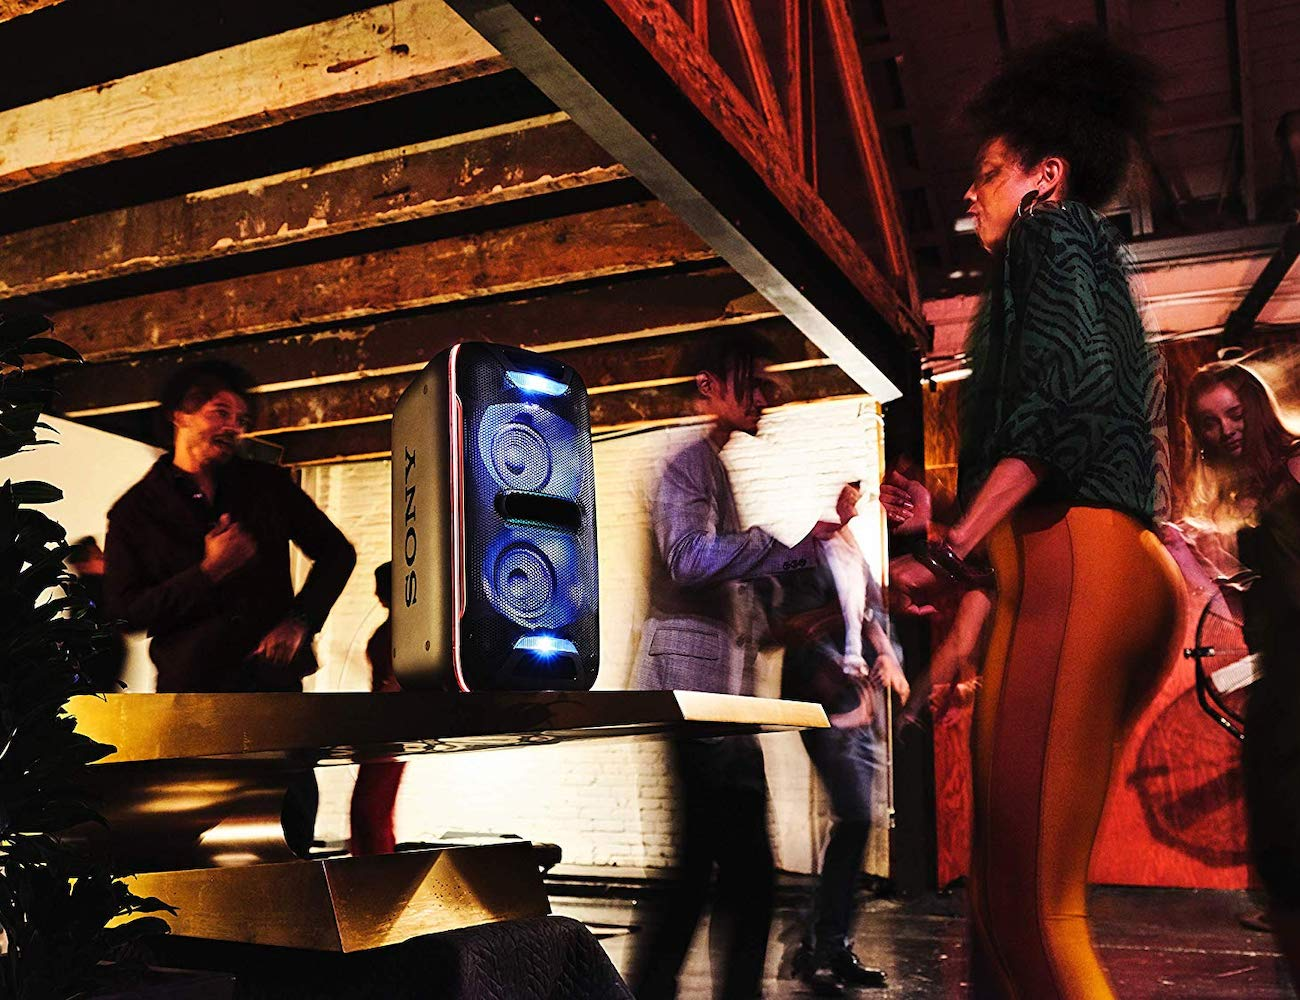 Sony GTK-XB72 Wireless Dance Party Speaker ups your disco tempo